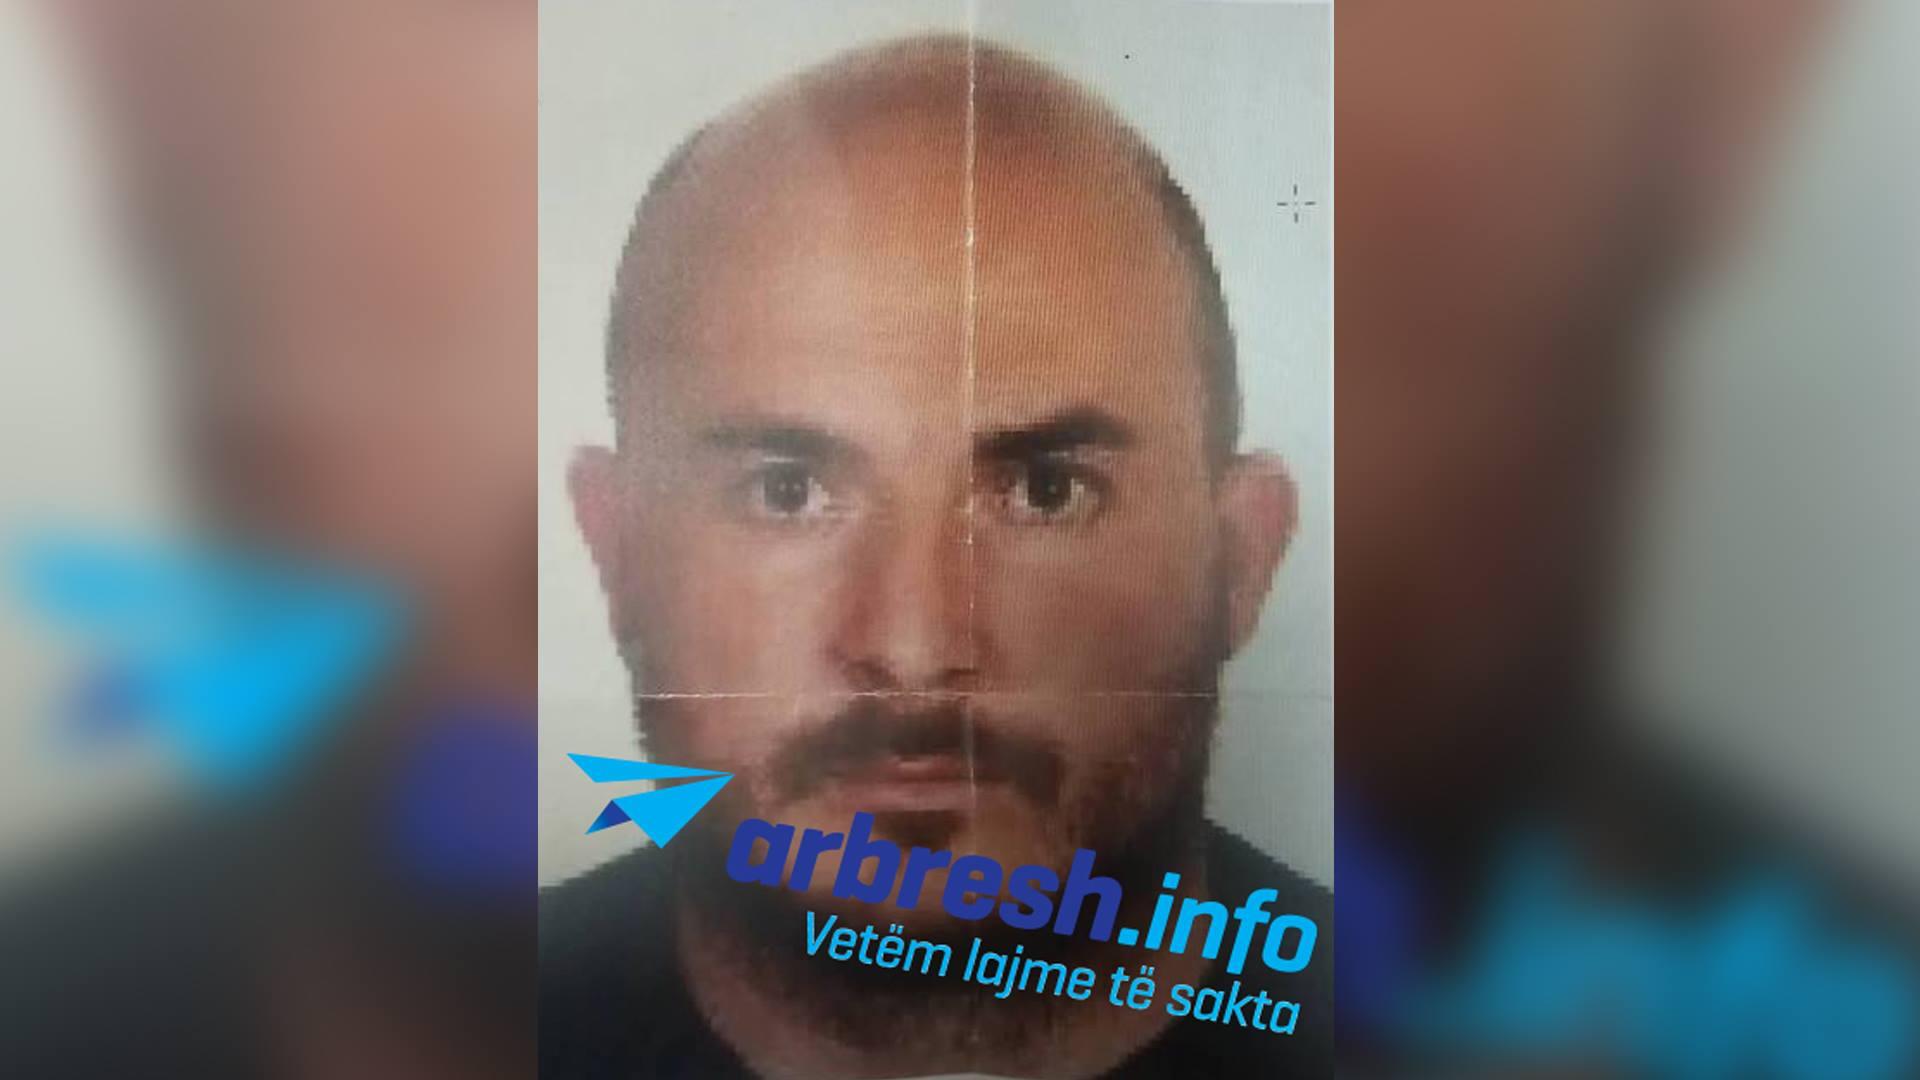 Оливера Ивановића ликвидирали криминалци Вождовачког клана уз асистенцију криминализованог дела БИА? 3